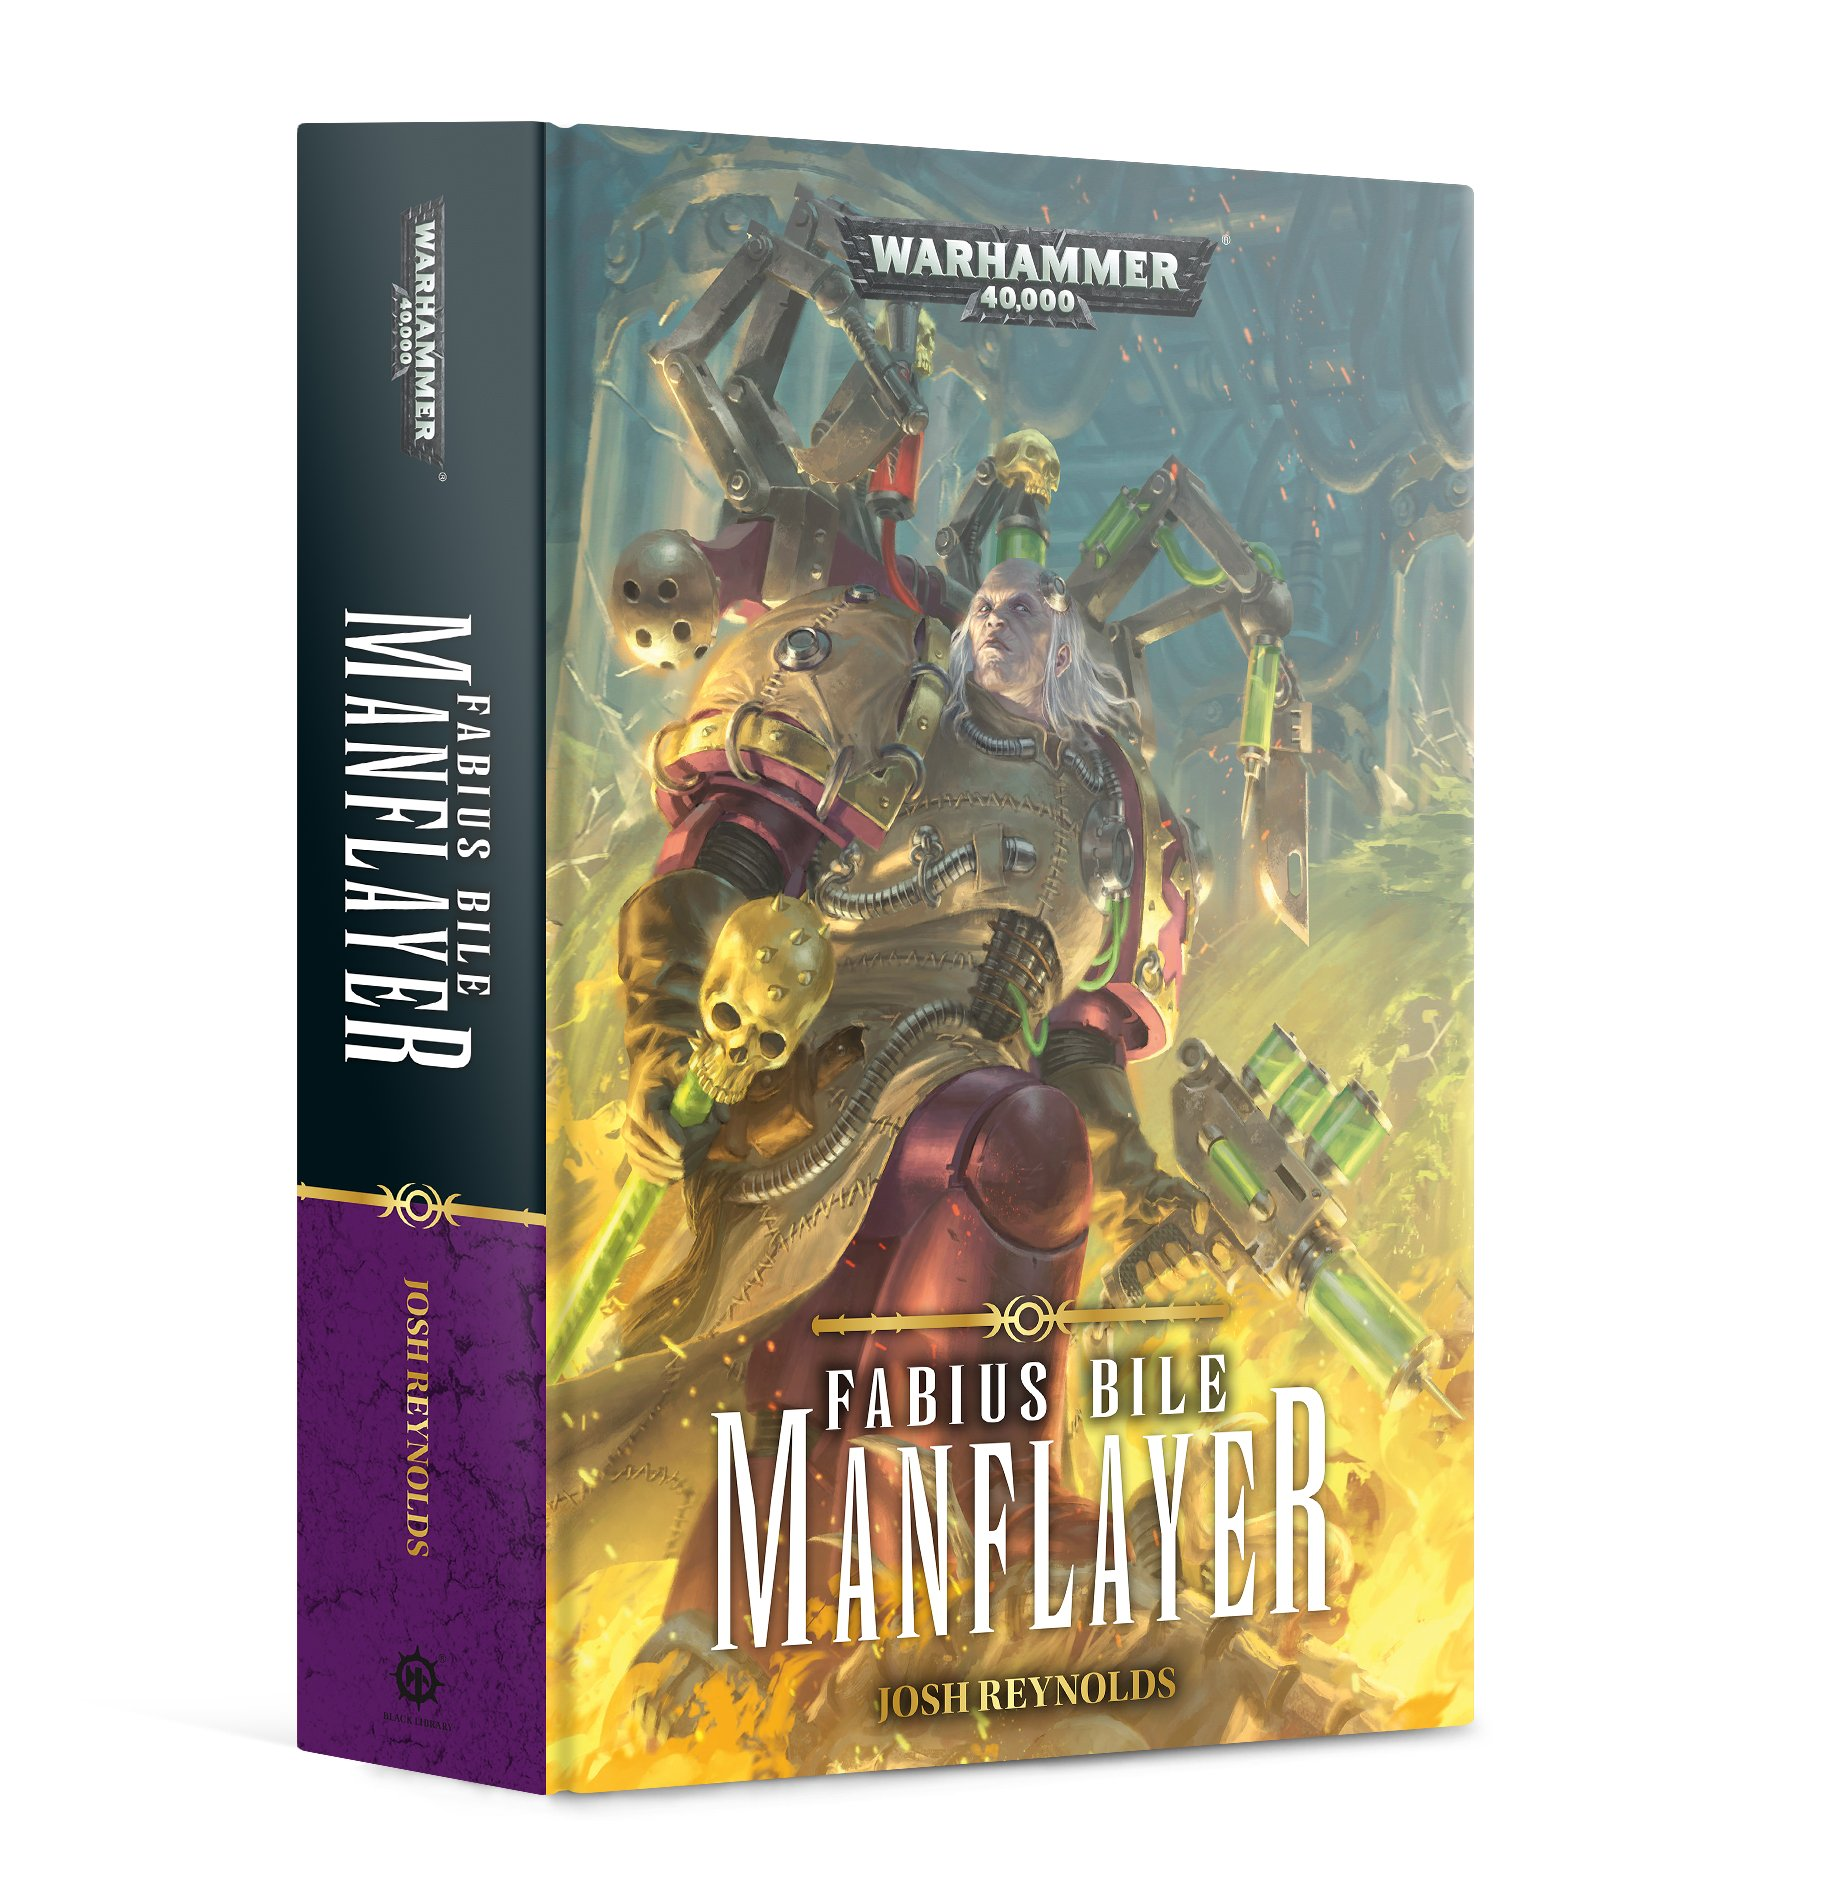 Fabius Bile: Manflayer, Black Library